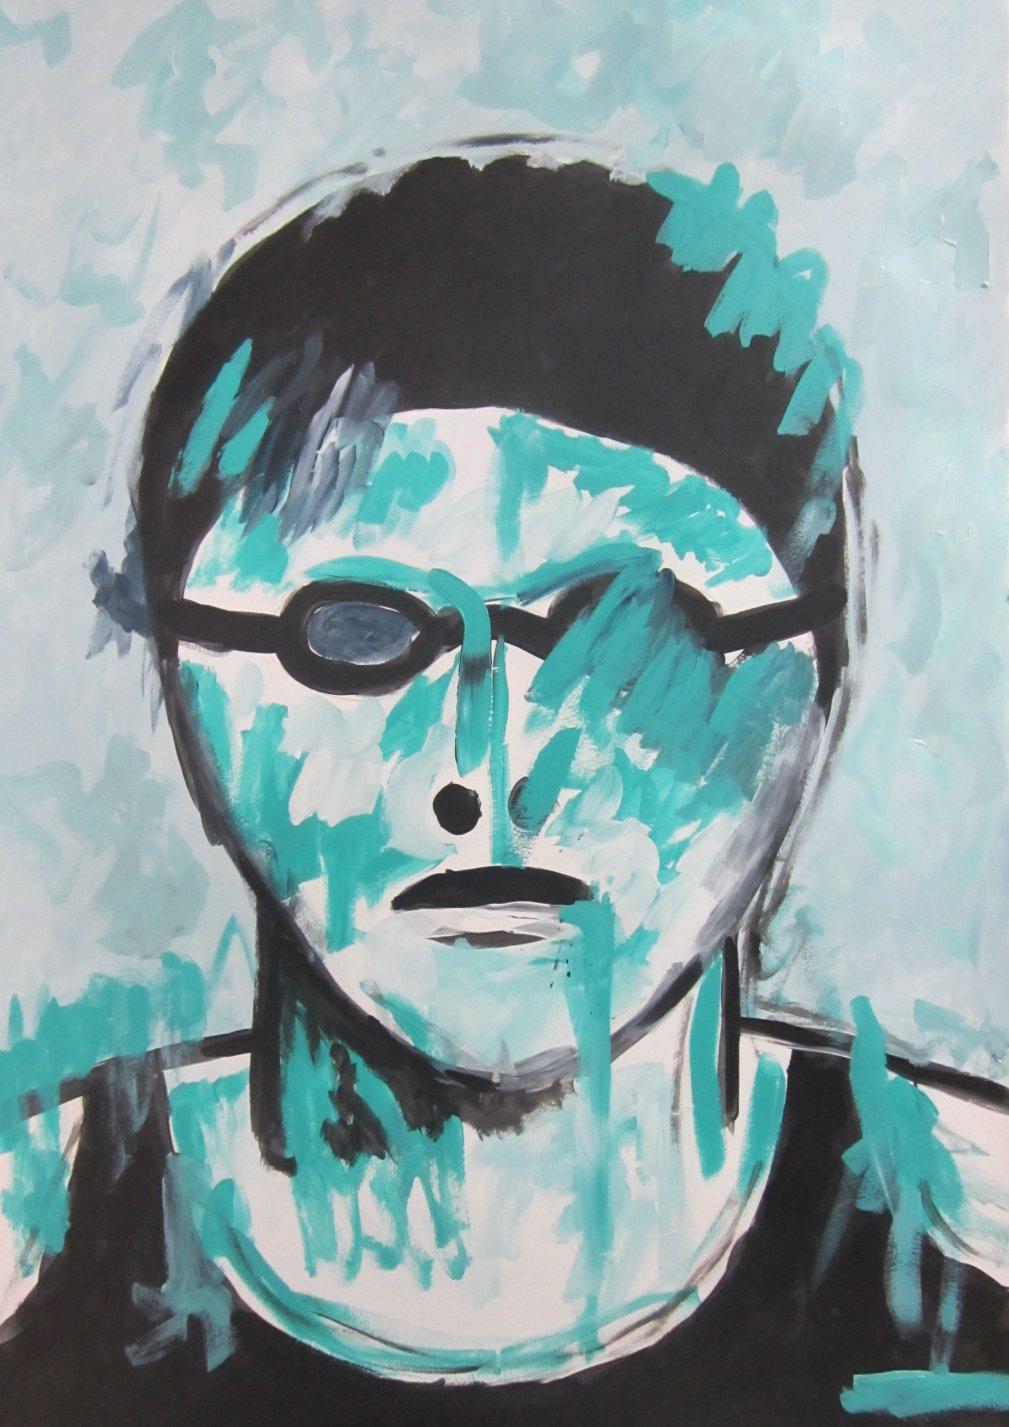 NADADOR BLUE (2021) - Francisco Serrano Gutierrez - F.Serrano